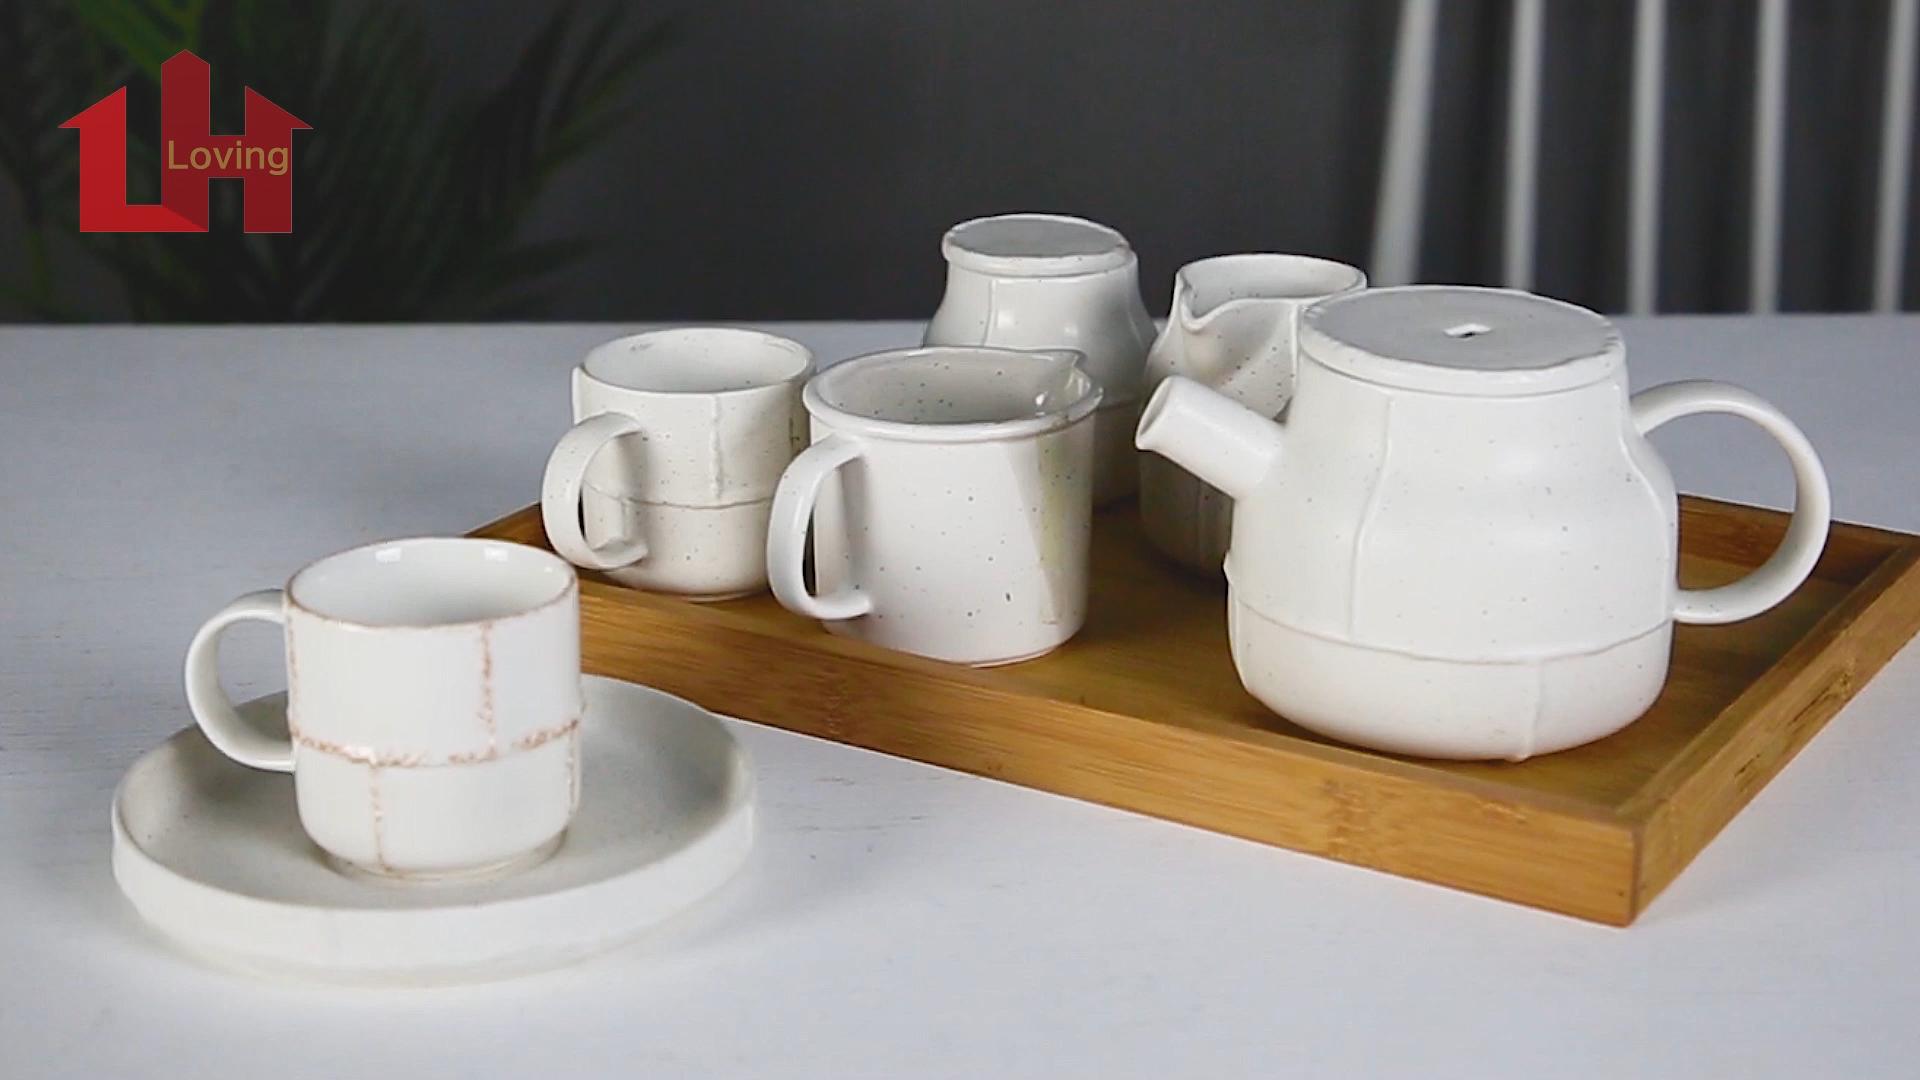 Rustic antique old white ceramic tea cup sets retro style reactive glazed porcelain coffee set